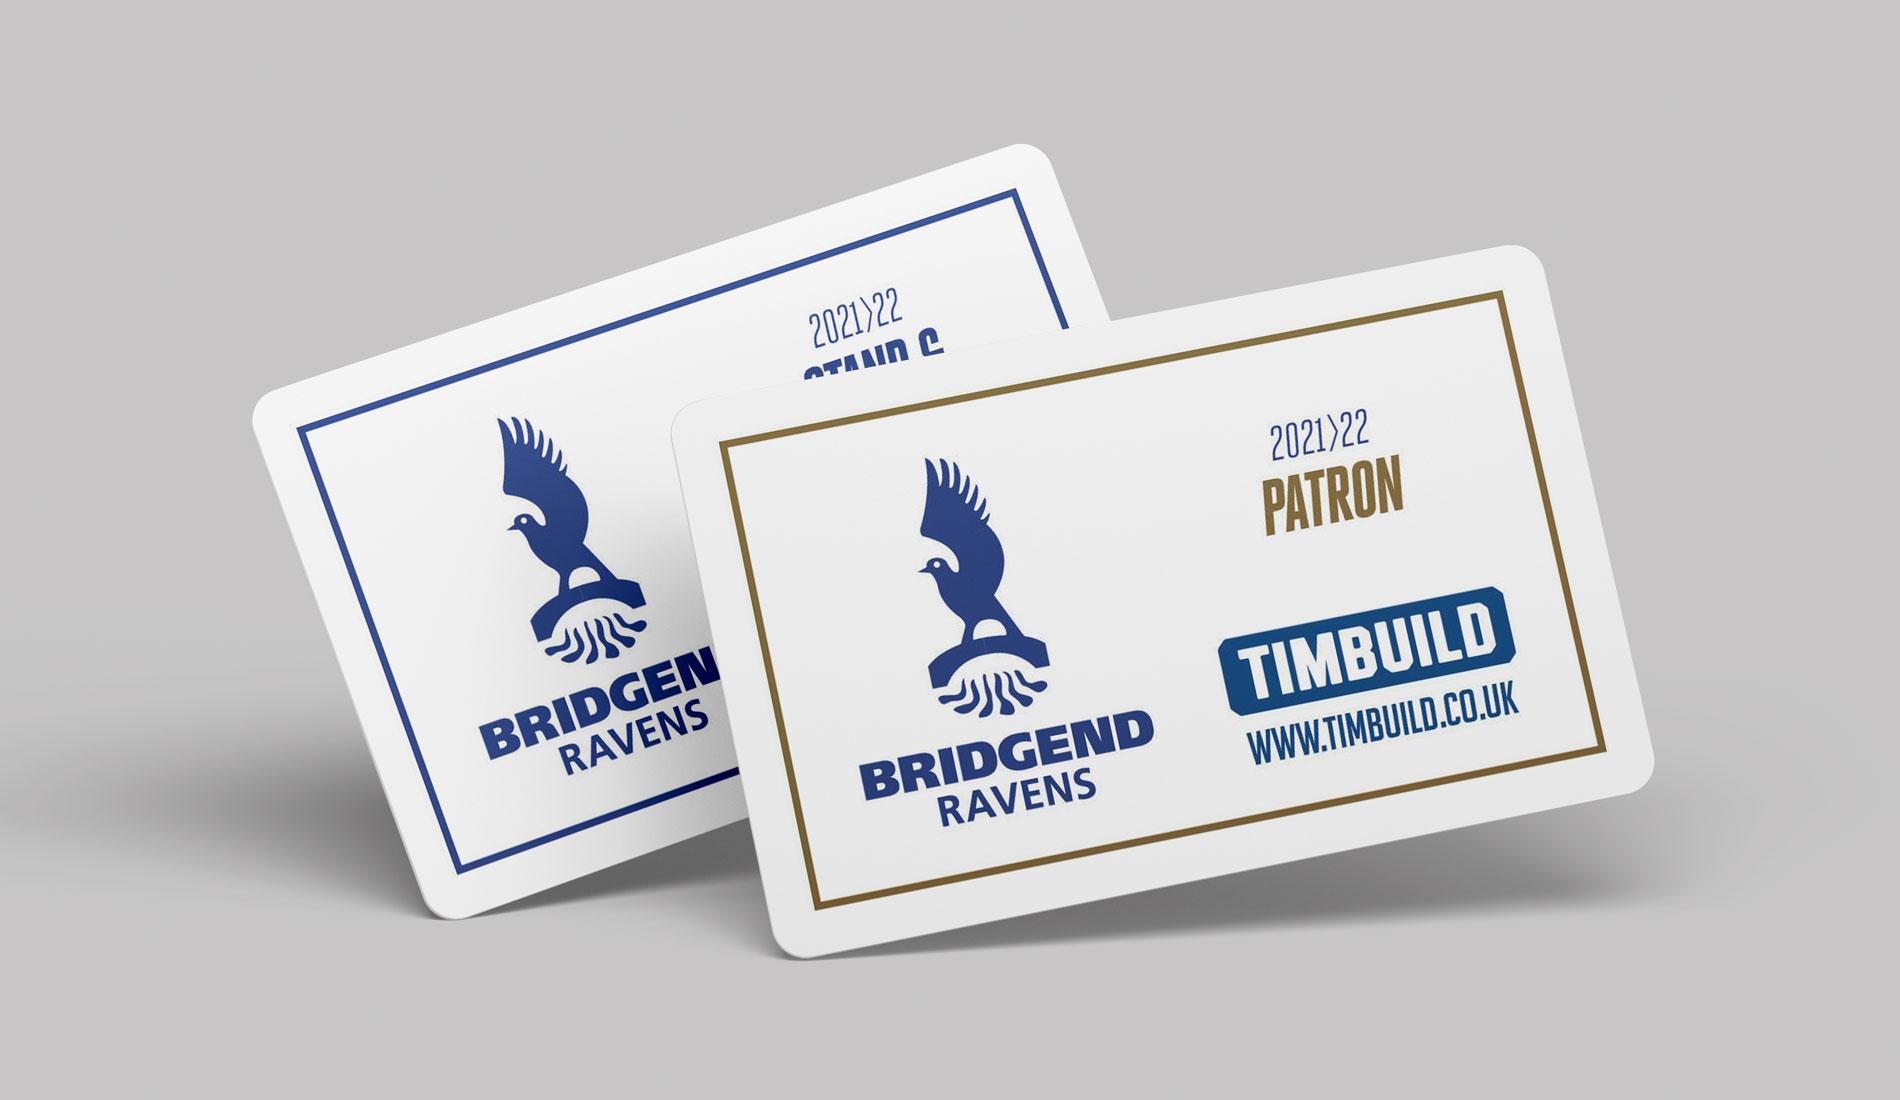 Bridgend Ravens Membership Cards